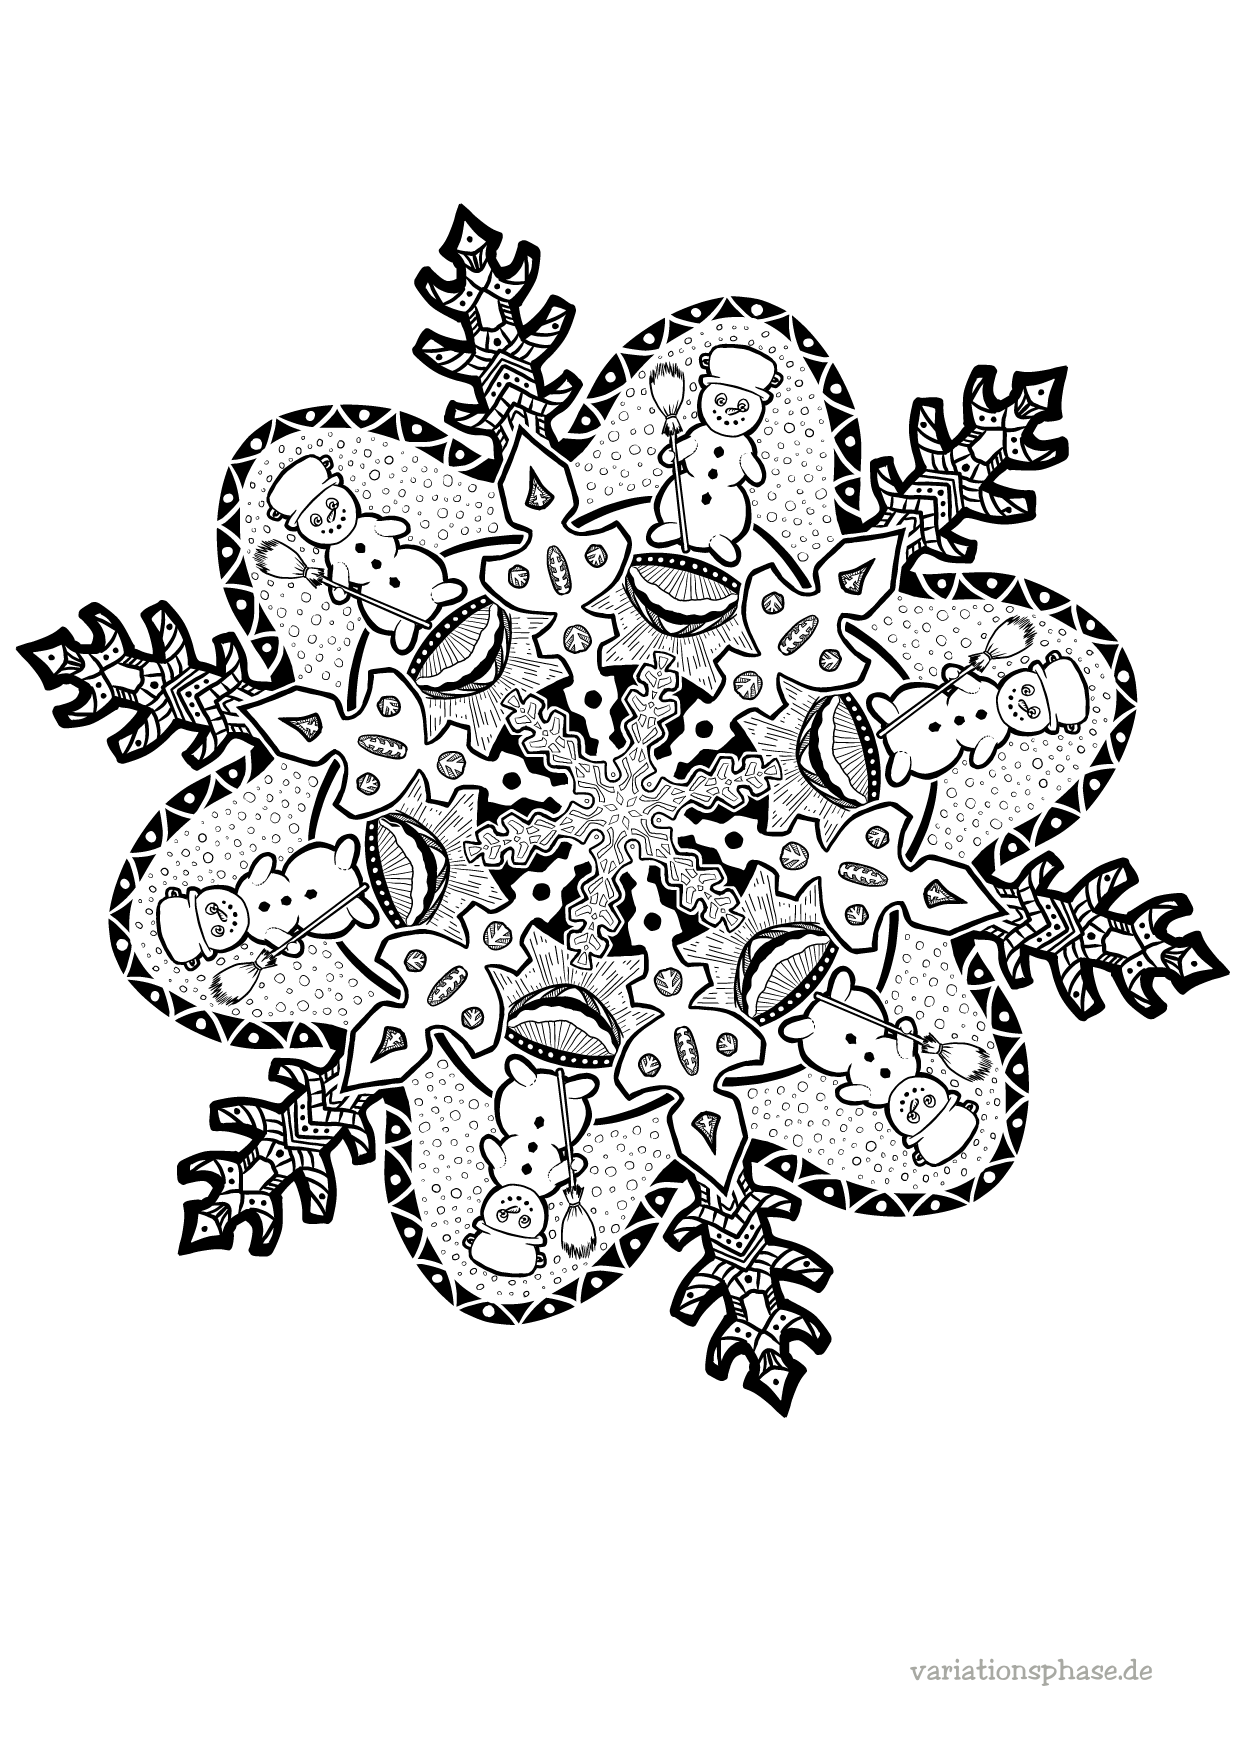 wintermandala zum ausmalen  variationsphase